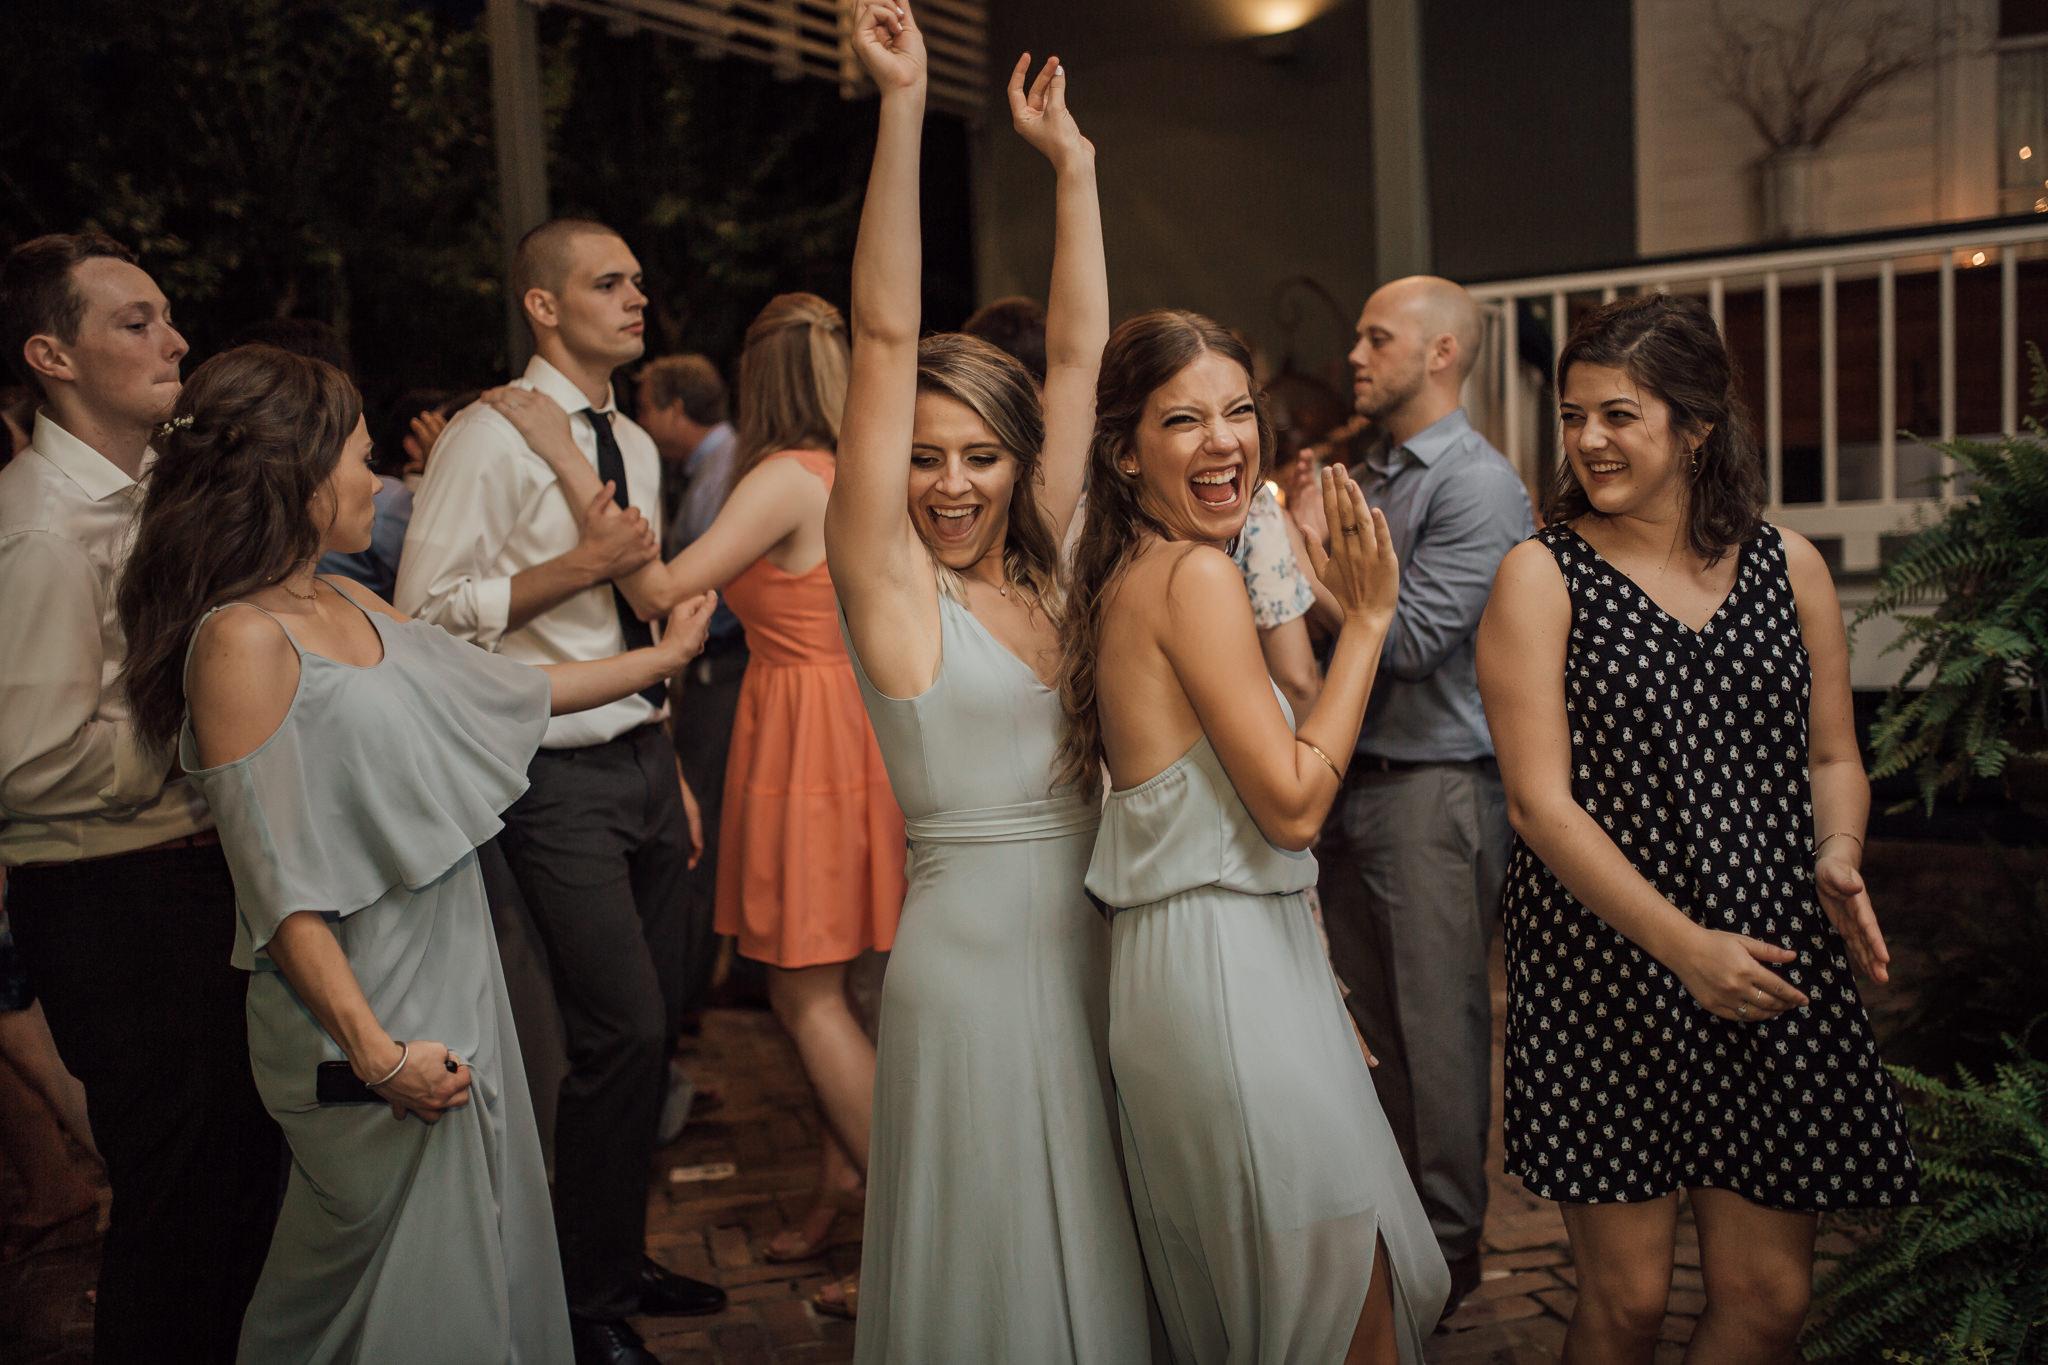 cassie-cook-photography-memphis-wedding-photographer-hedge-farm-wedding-venue-39.jpg